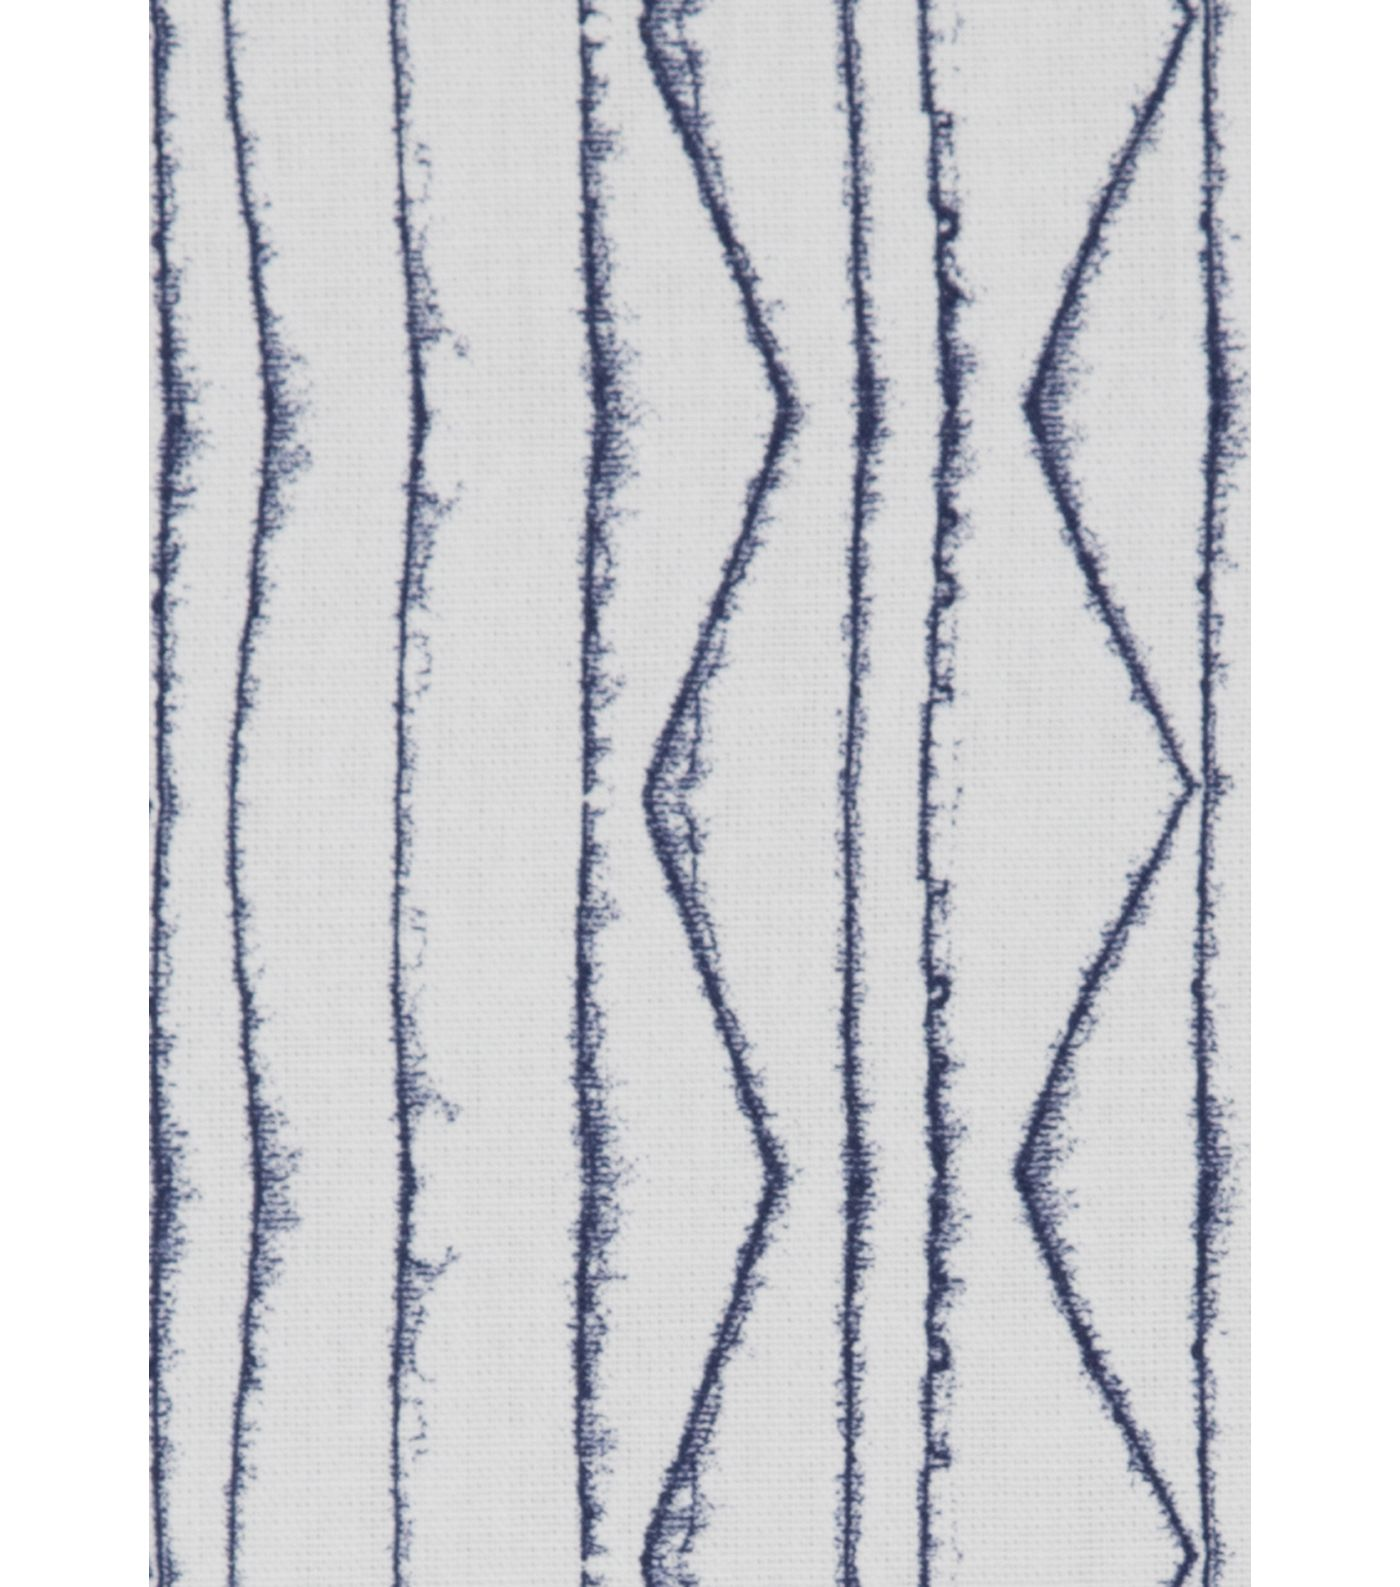 Nate Berkus Home Decor Fabric 54\u0022-Cleone Paramount Caspian